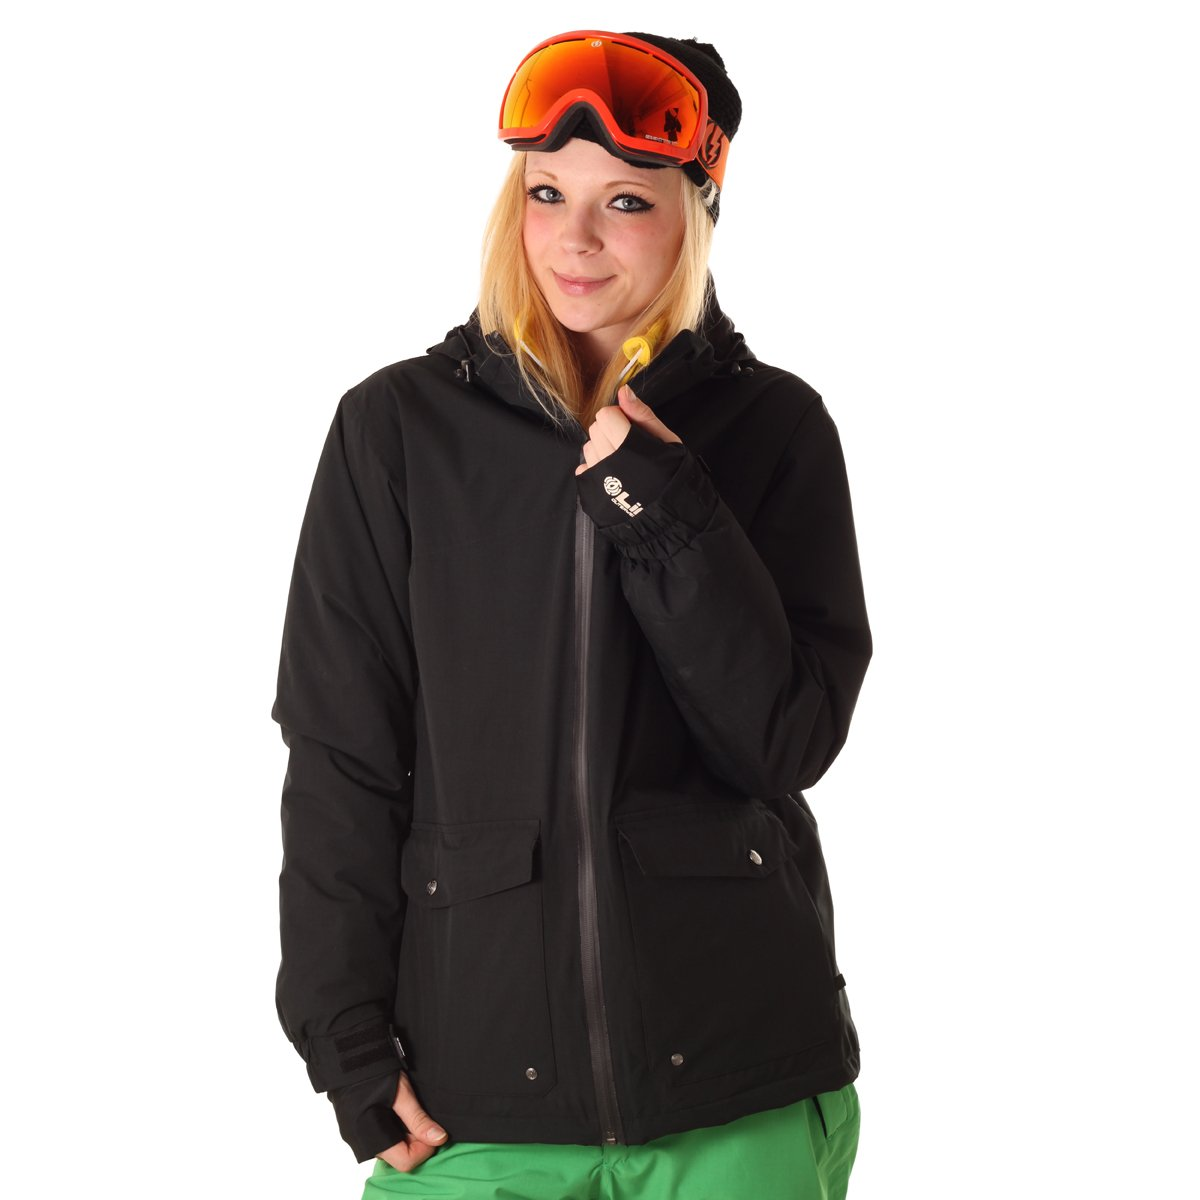 light damen snowboardjacke june fa776 12 jetzt kaufen. Black Bedroom Furniture Sets. Home Design Ideas